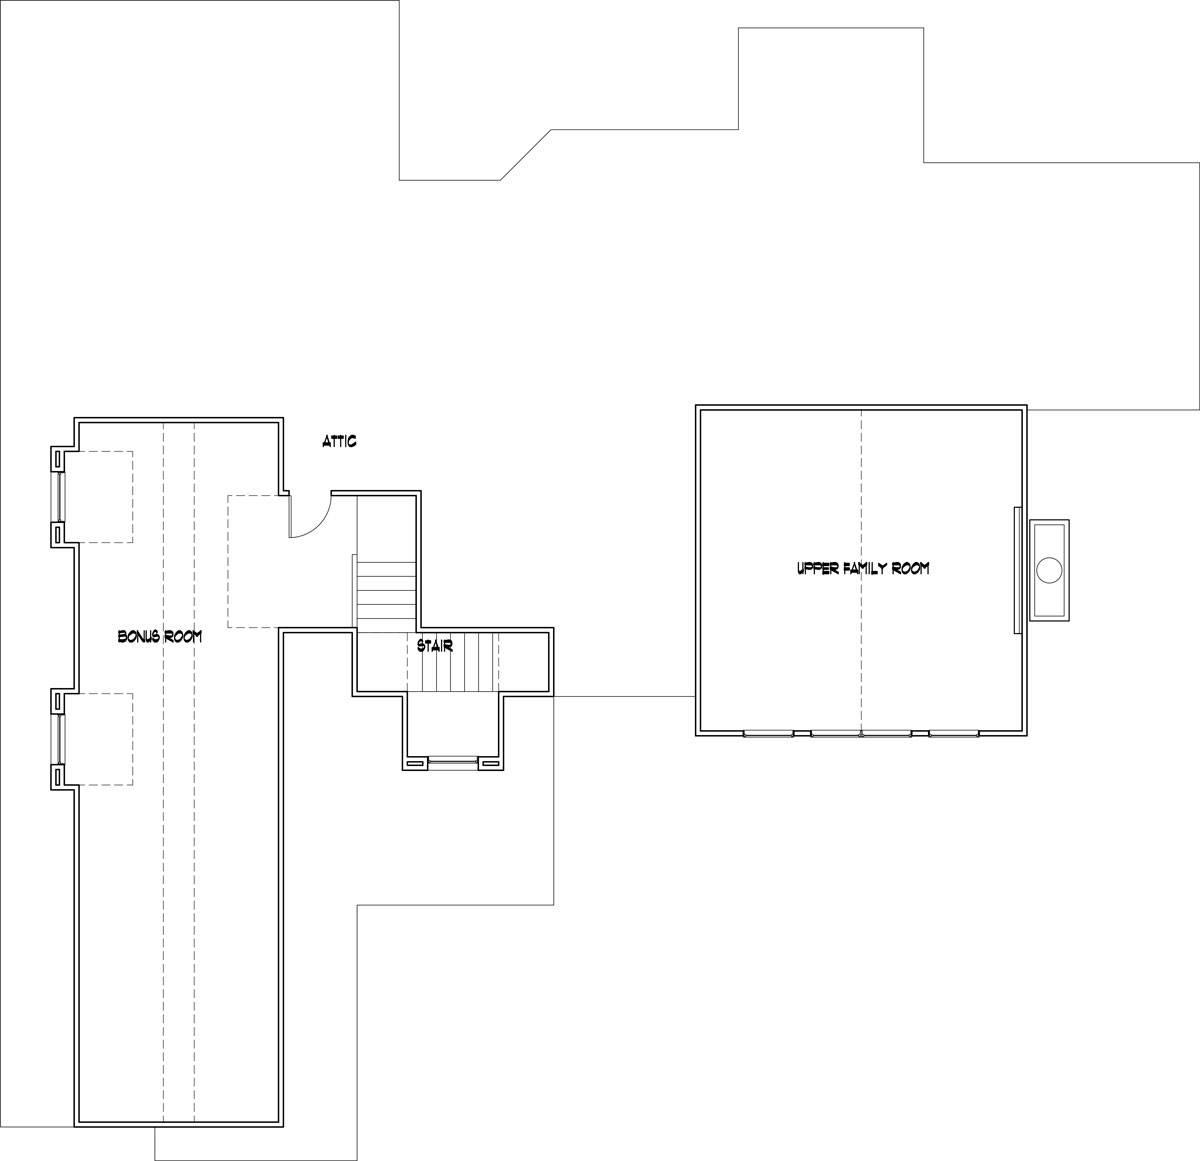 Bonus above 3-car garage by DFD House Plans